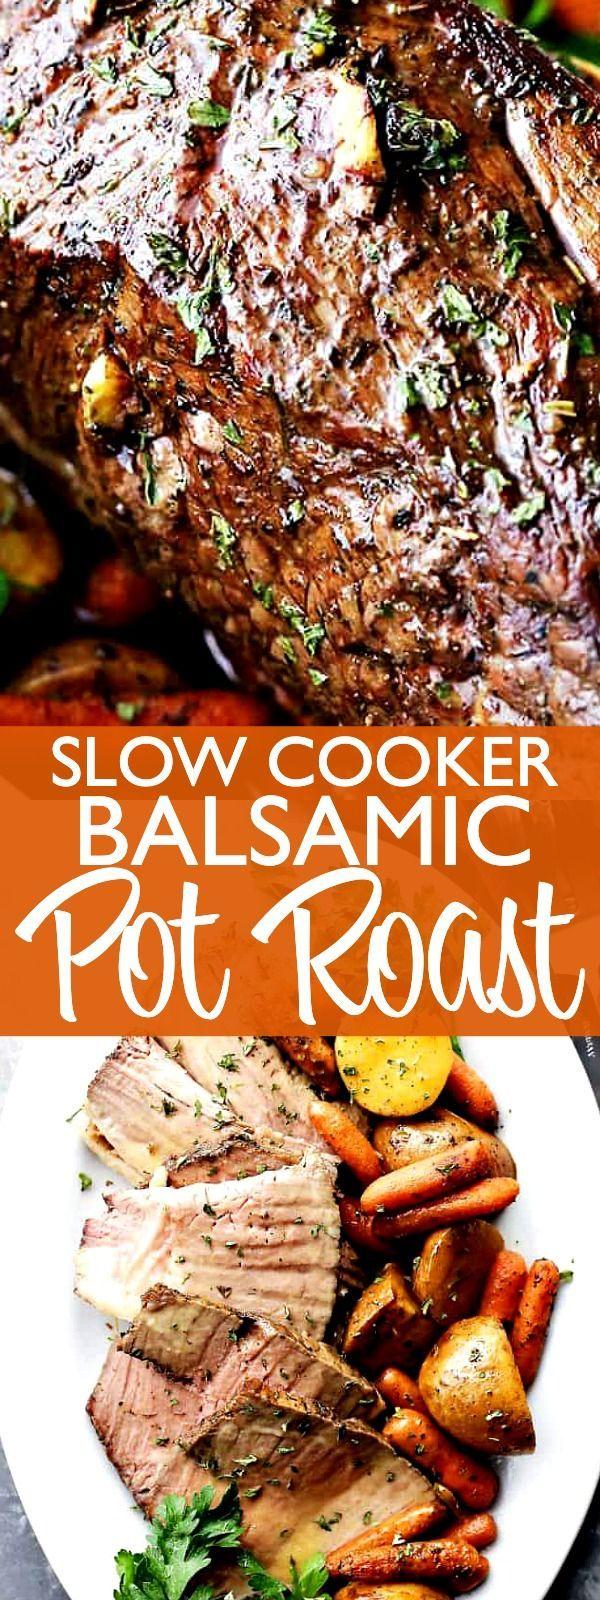 Slow Cooker Balsamic Pot Roast - Diethood